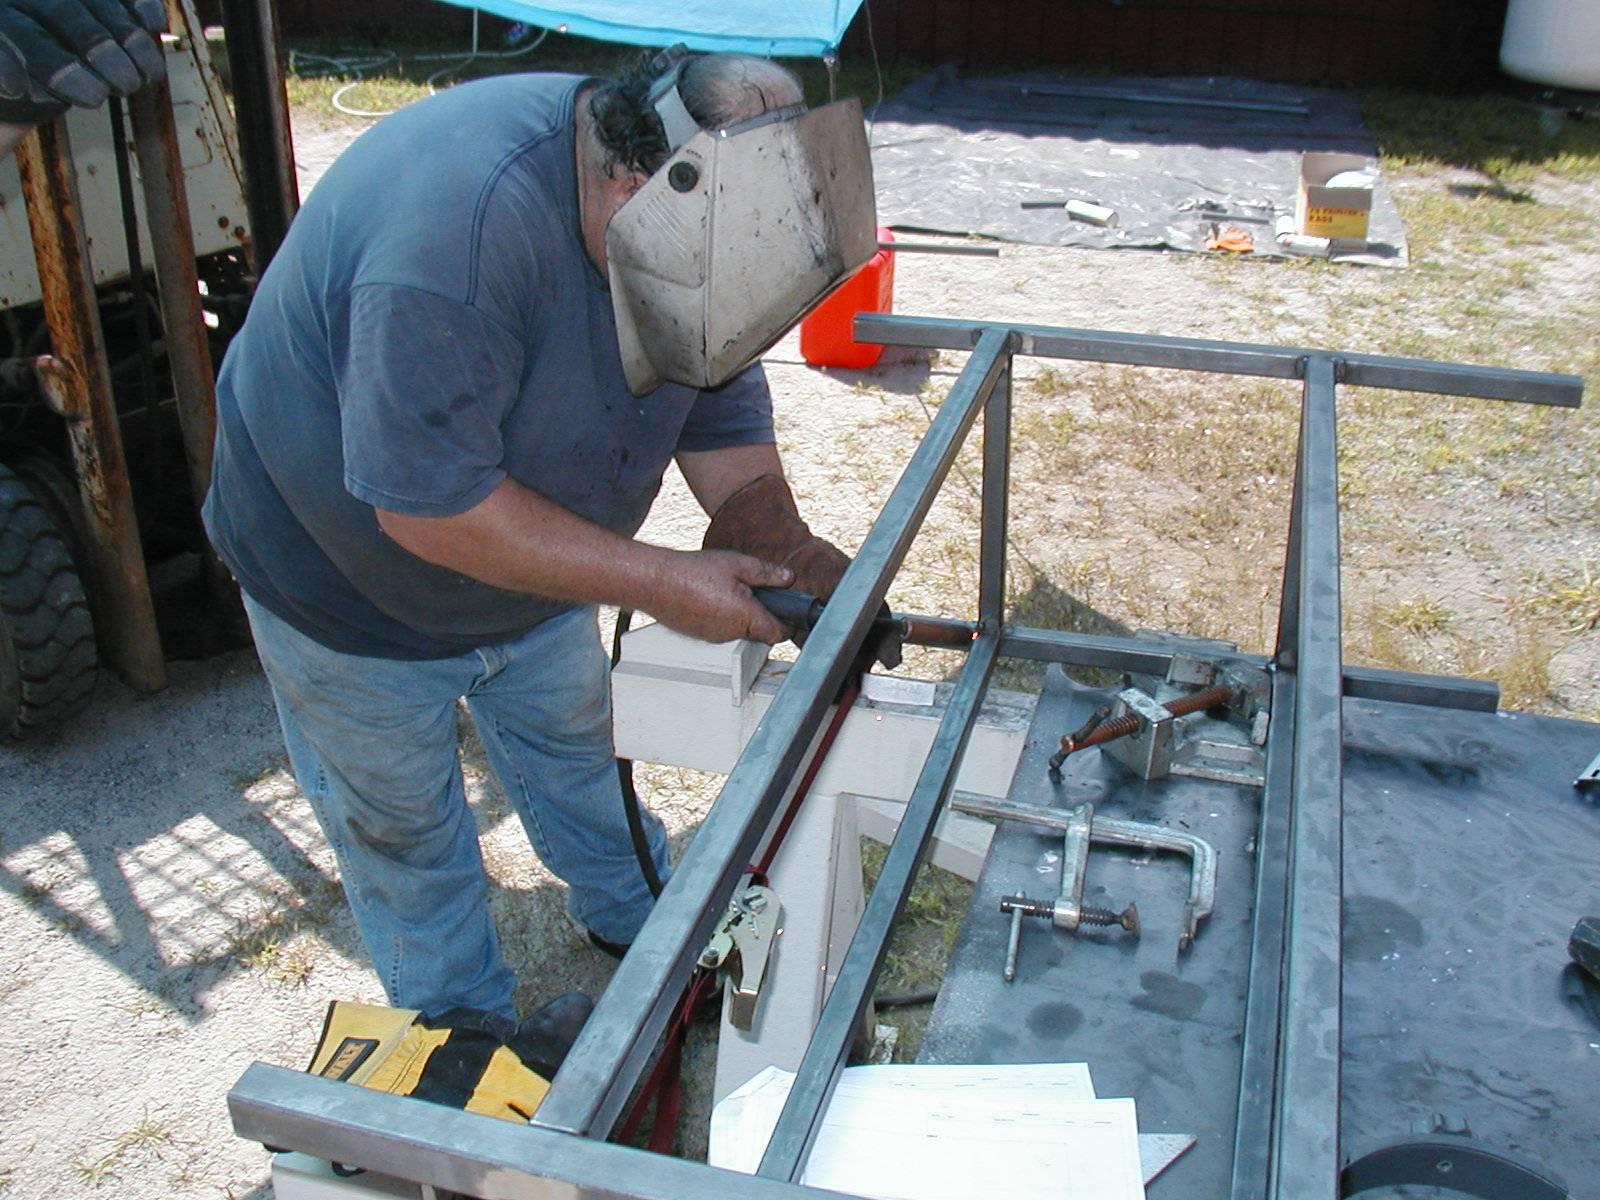 Welding the bench frame